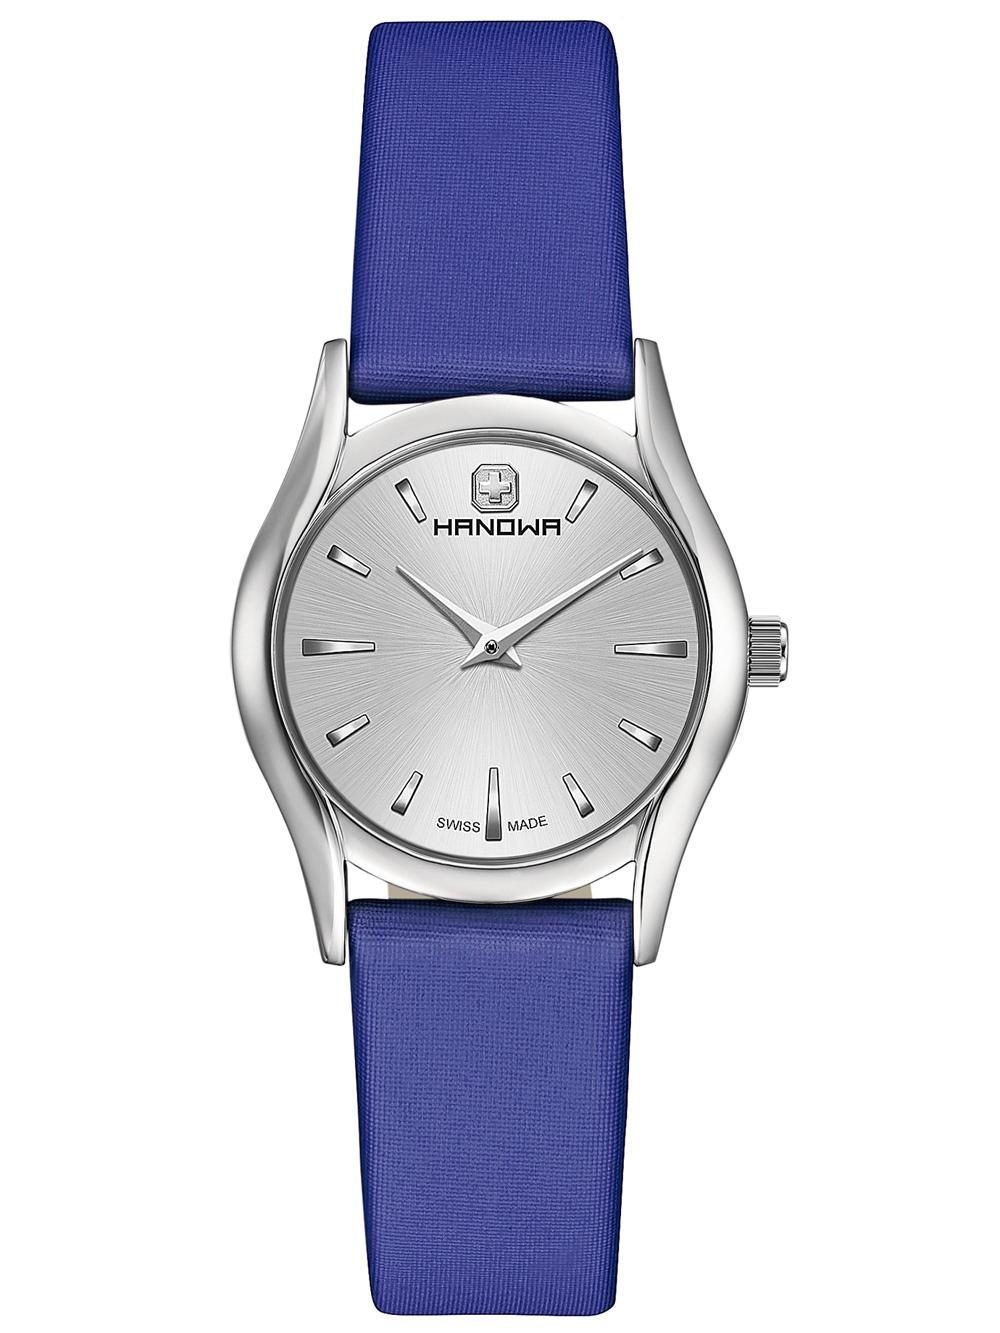 Uhren - Hanowa 16 6035.04.001.03 Opera Damen 29mm 3ATM  - Onlineshop Timeshop24